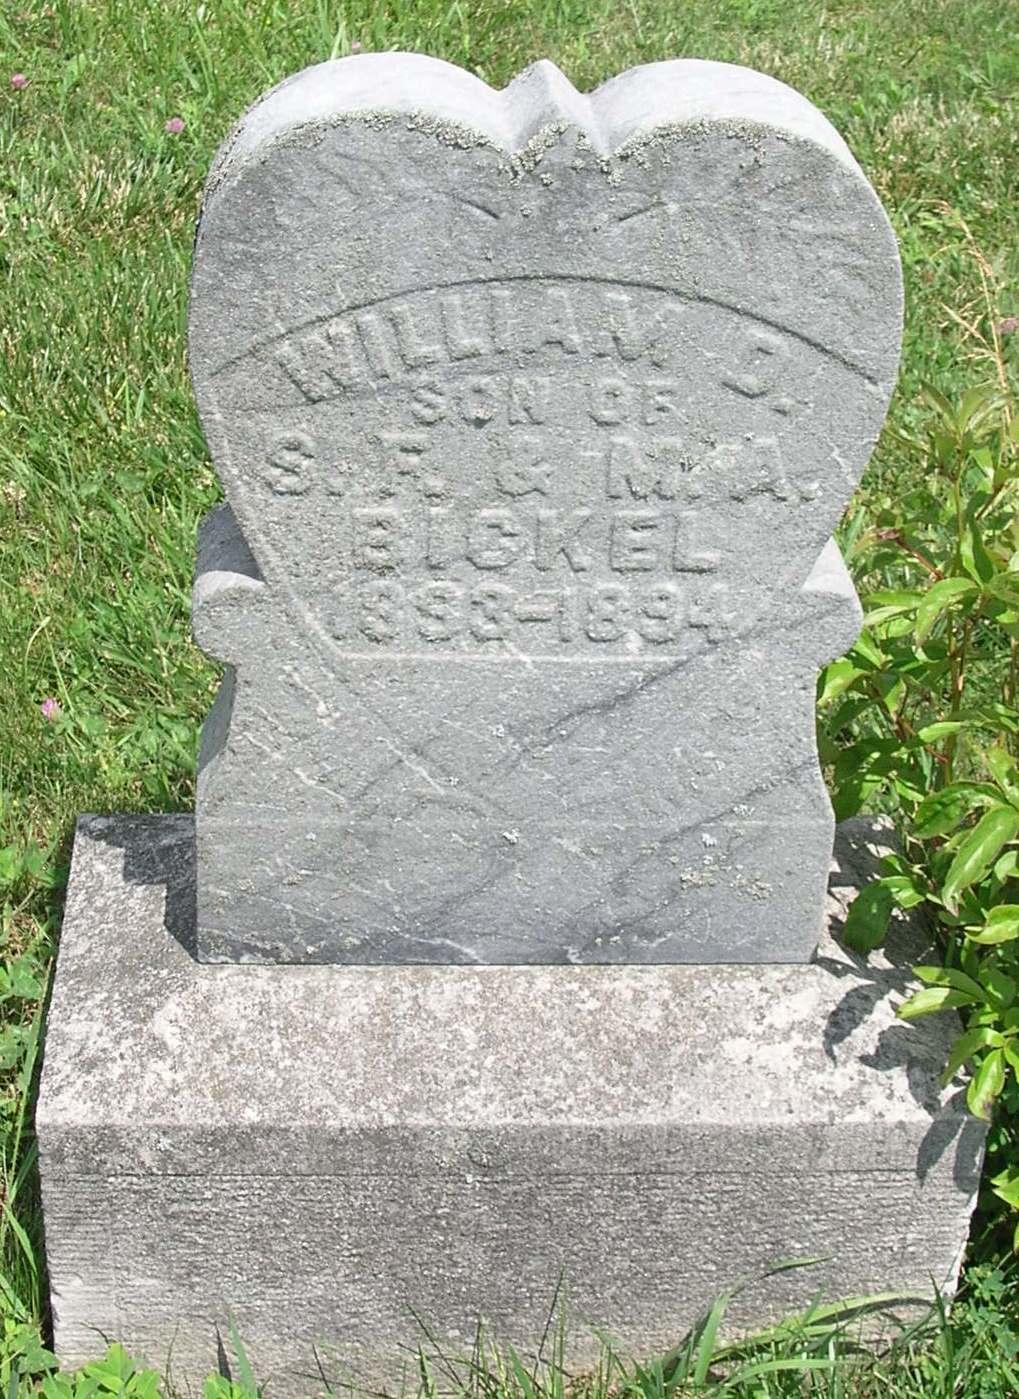 Jay County Indiana - Antioch Cemetery